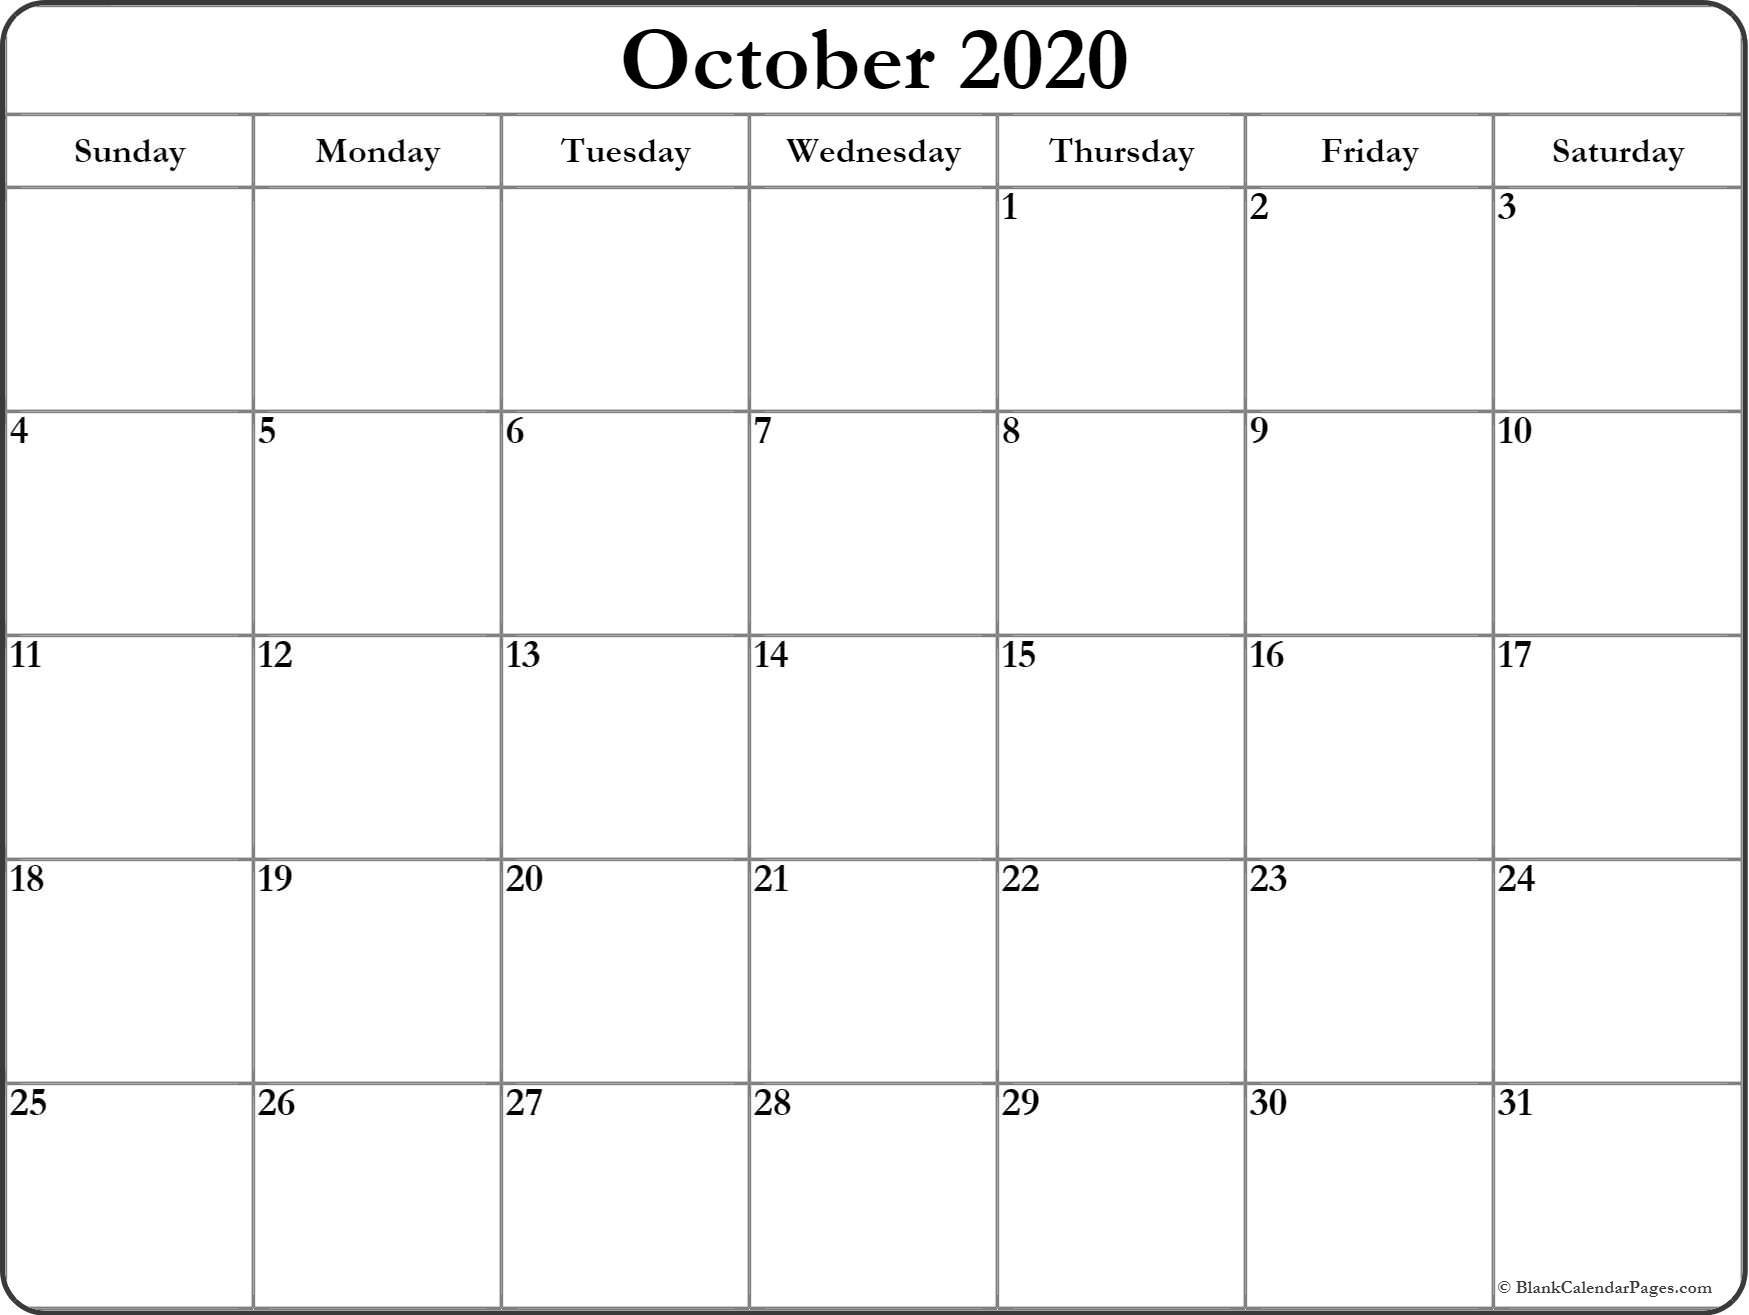 October 2020 Blank Calendar Templates.-Fill In Calendar Template 2020